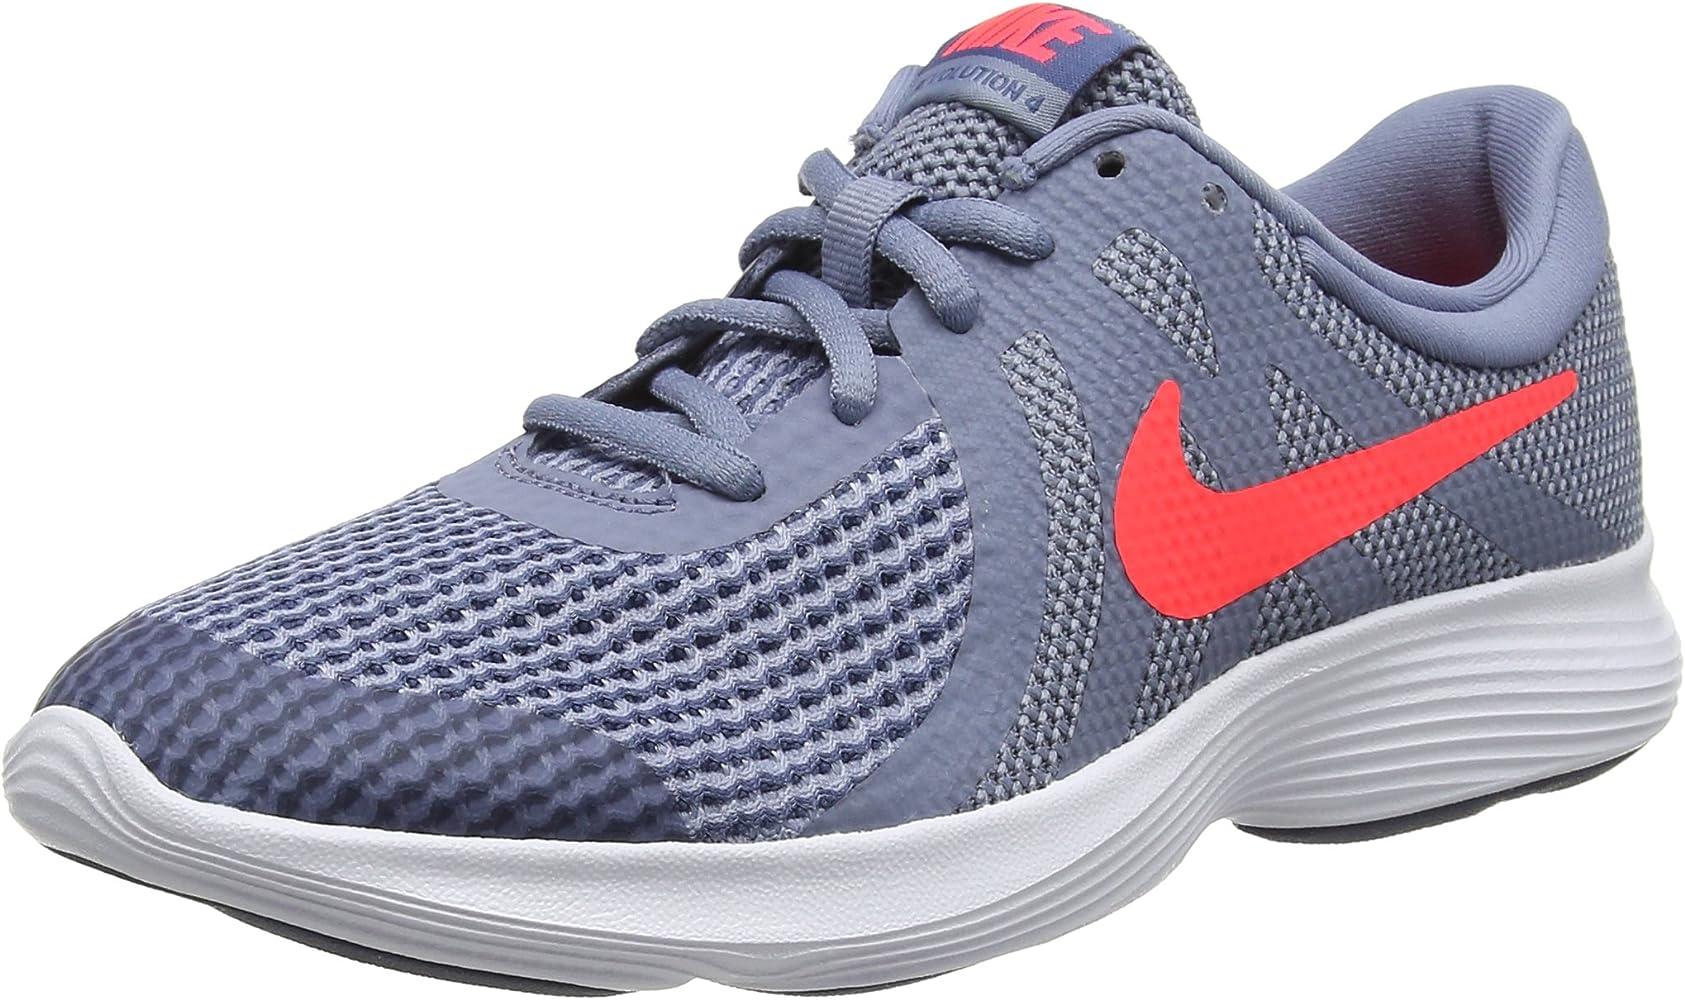 09f46fc7 Nike Revolution 4 (GS), Zapatillas de Running para Niños, Gris (Ashen